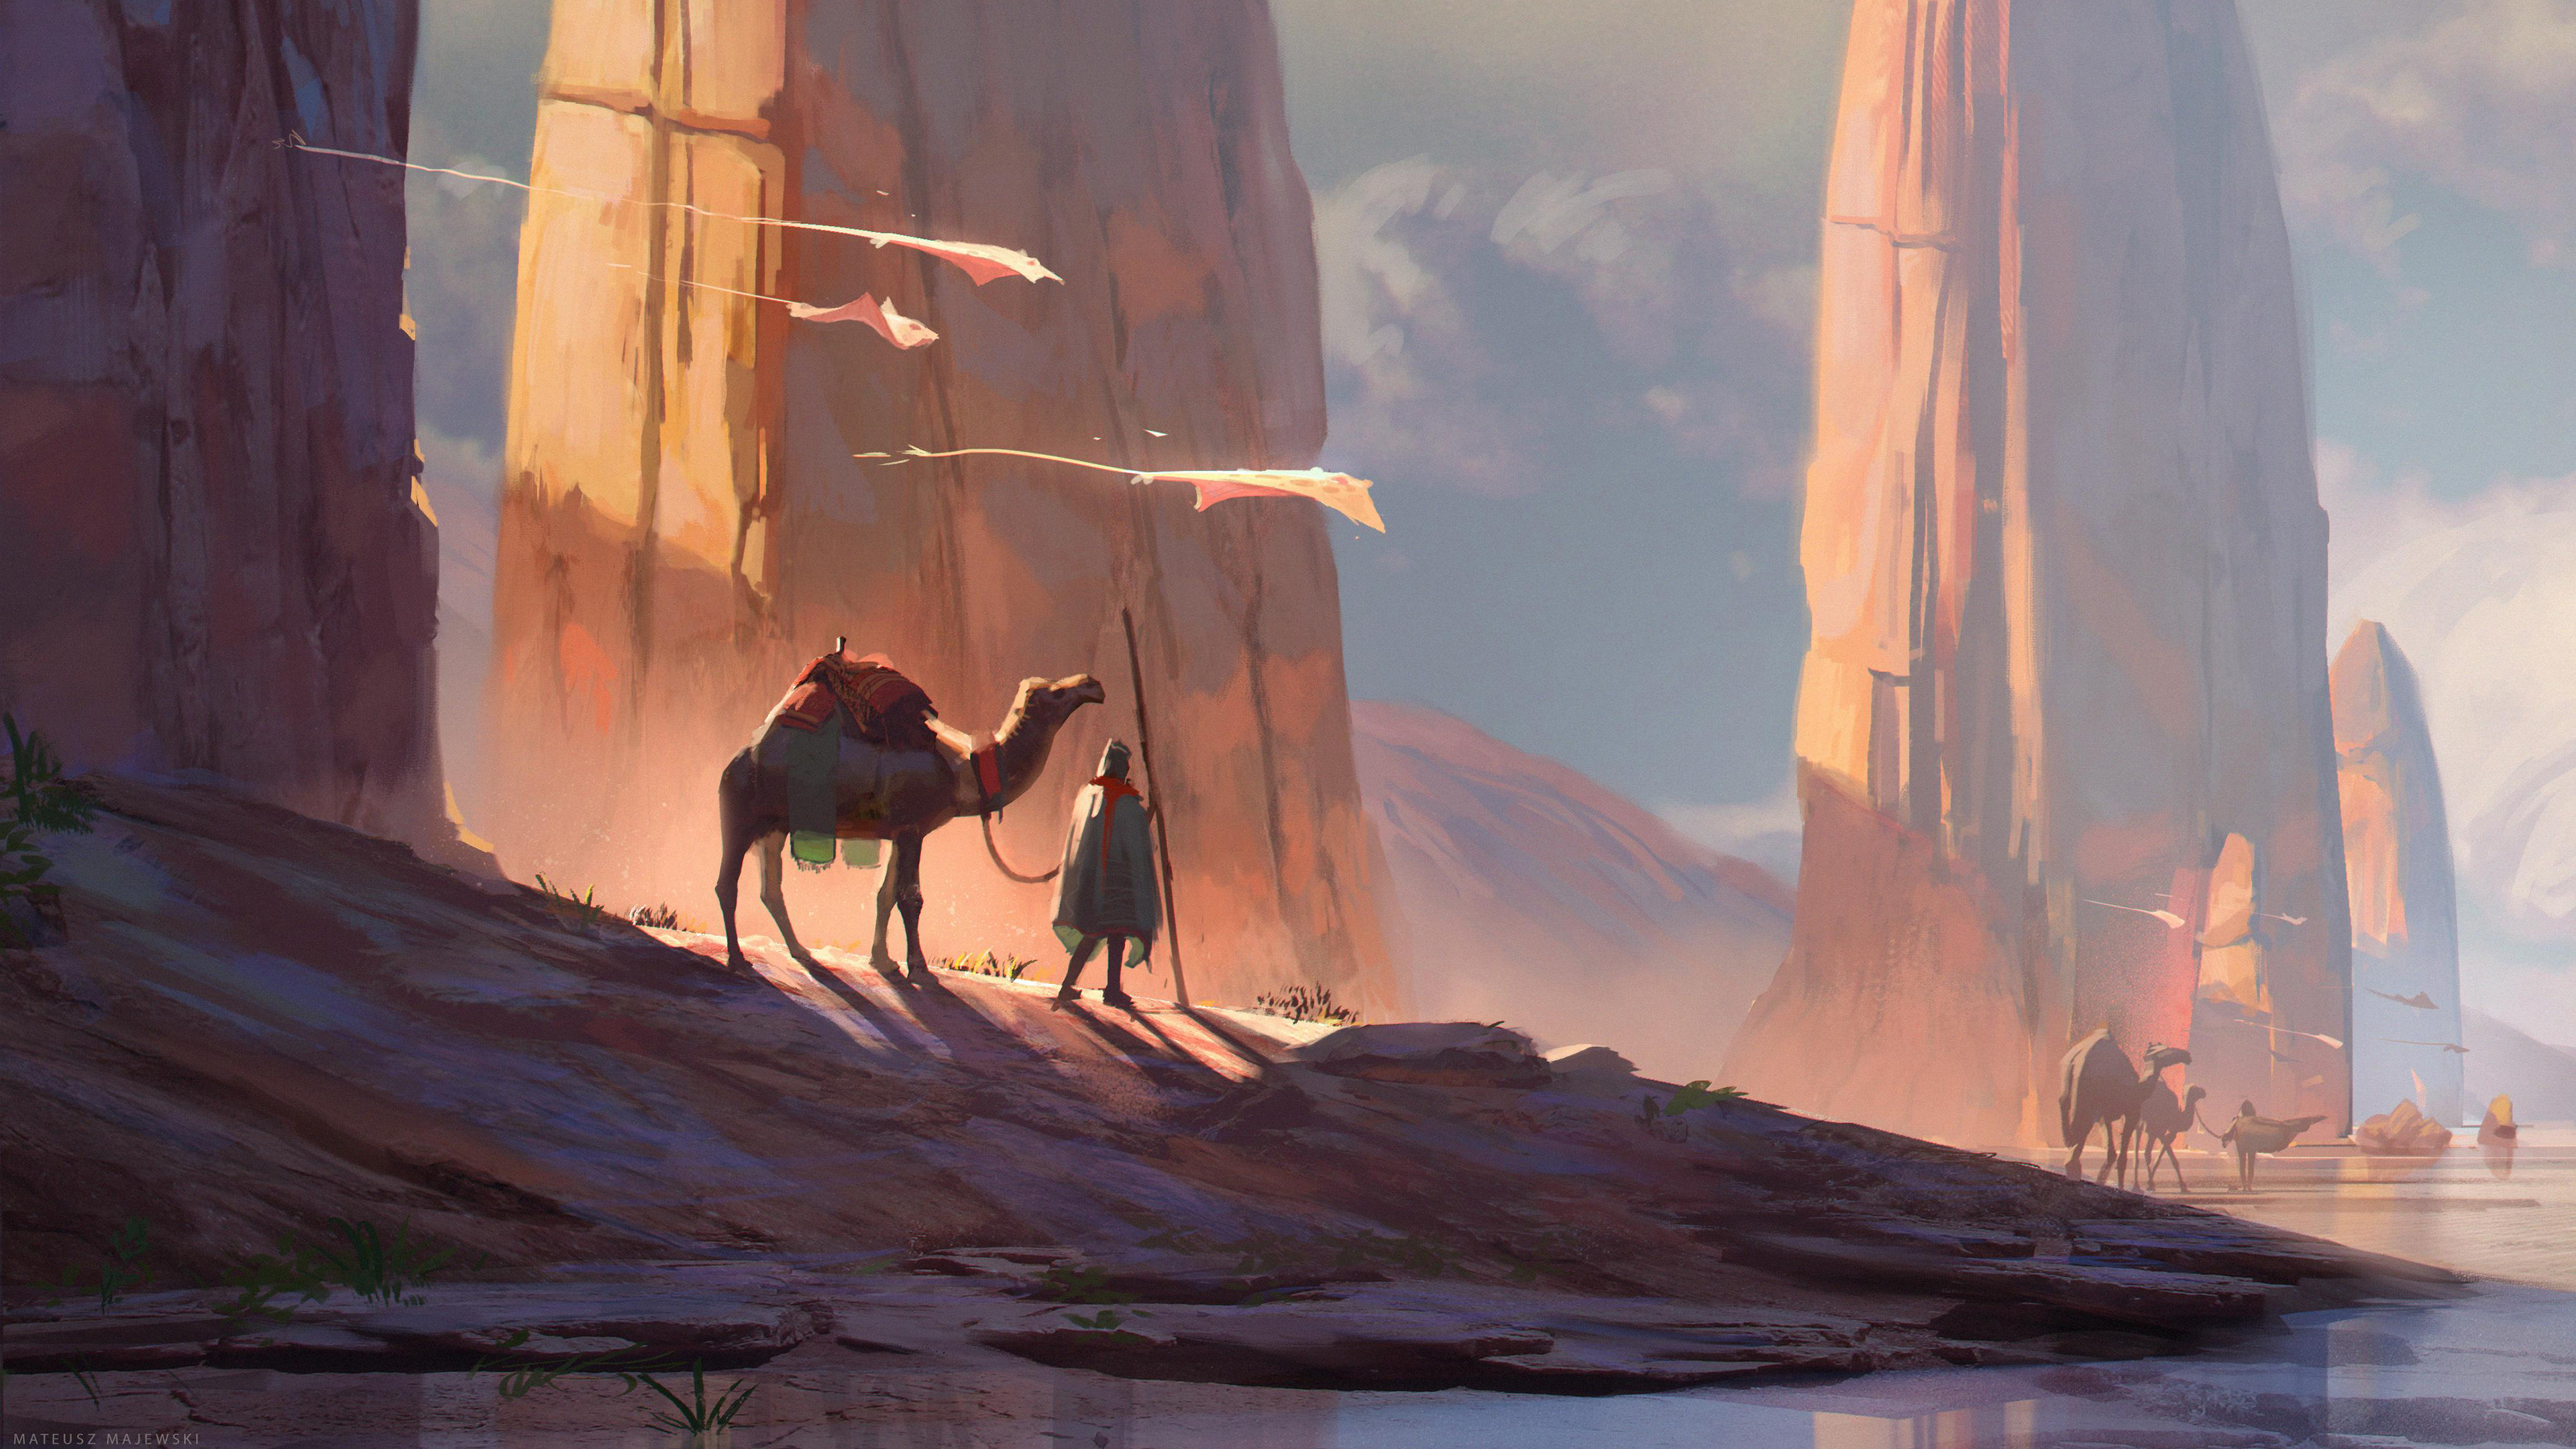 digital art camel desert 4k 1540755522 - Digital Art Camel Desert 4k - hd-wallpapers, digital art wallpapers, desert wallpapers, camel wallpapers, artwork wallpapers, artist wallpapers, 4k-wallpapers